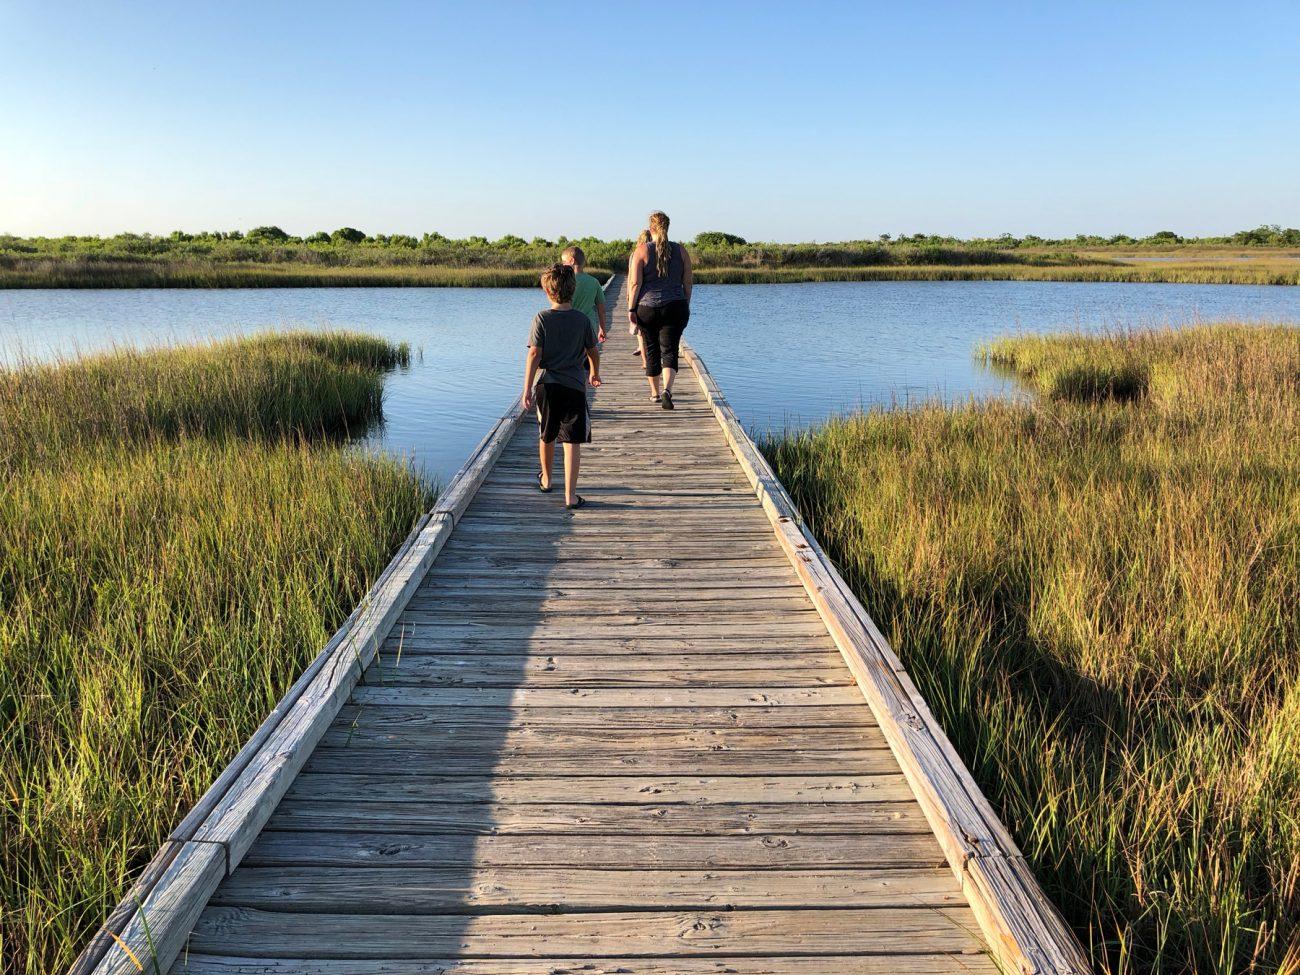 Family crossing bridge at Galveston